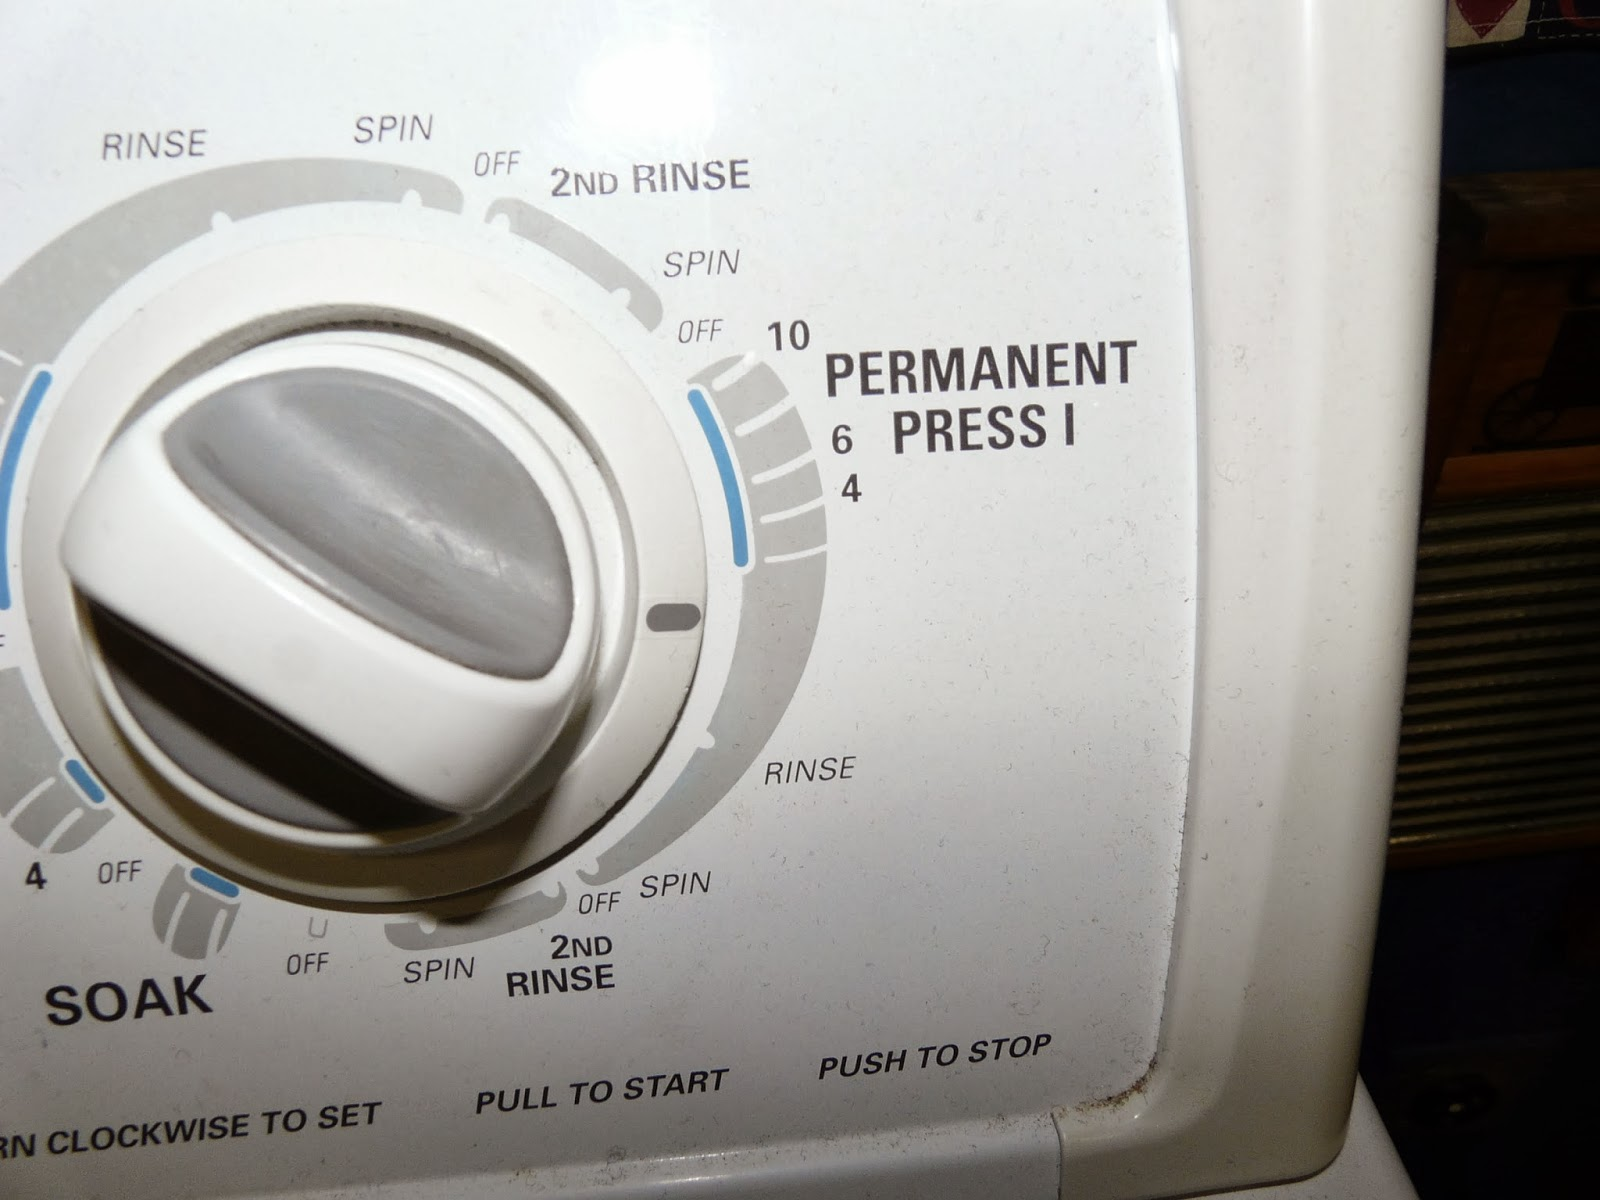 wash sweater in washing machine